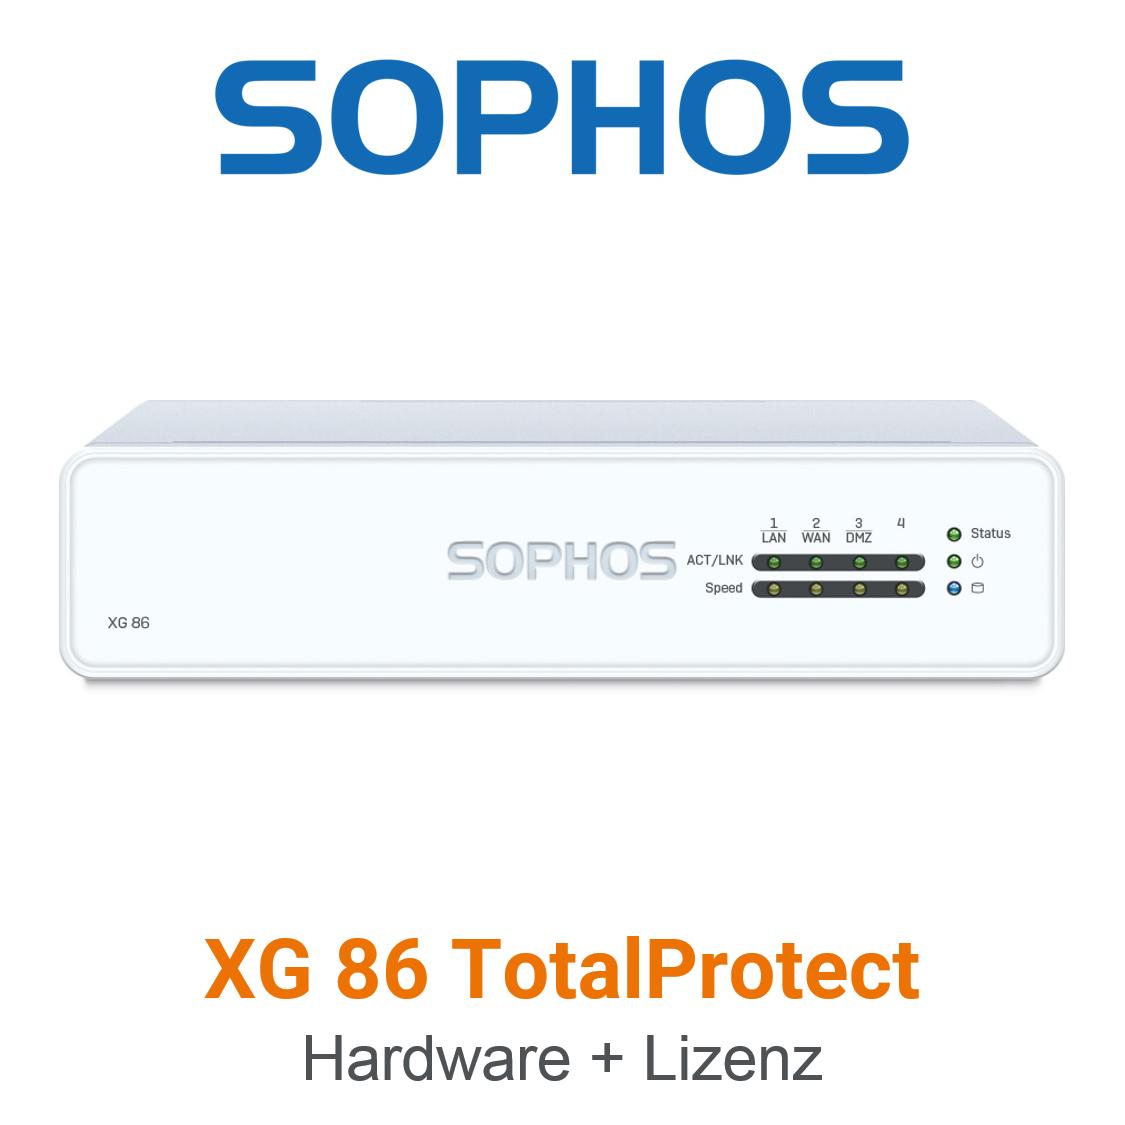 Sophos XG 86 TotalProtect Bundle (Hardware + Lizenz)